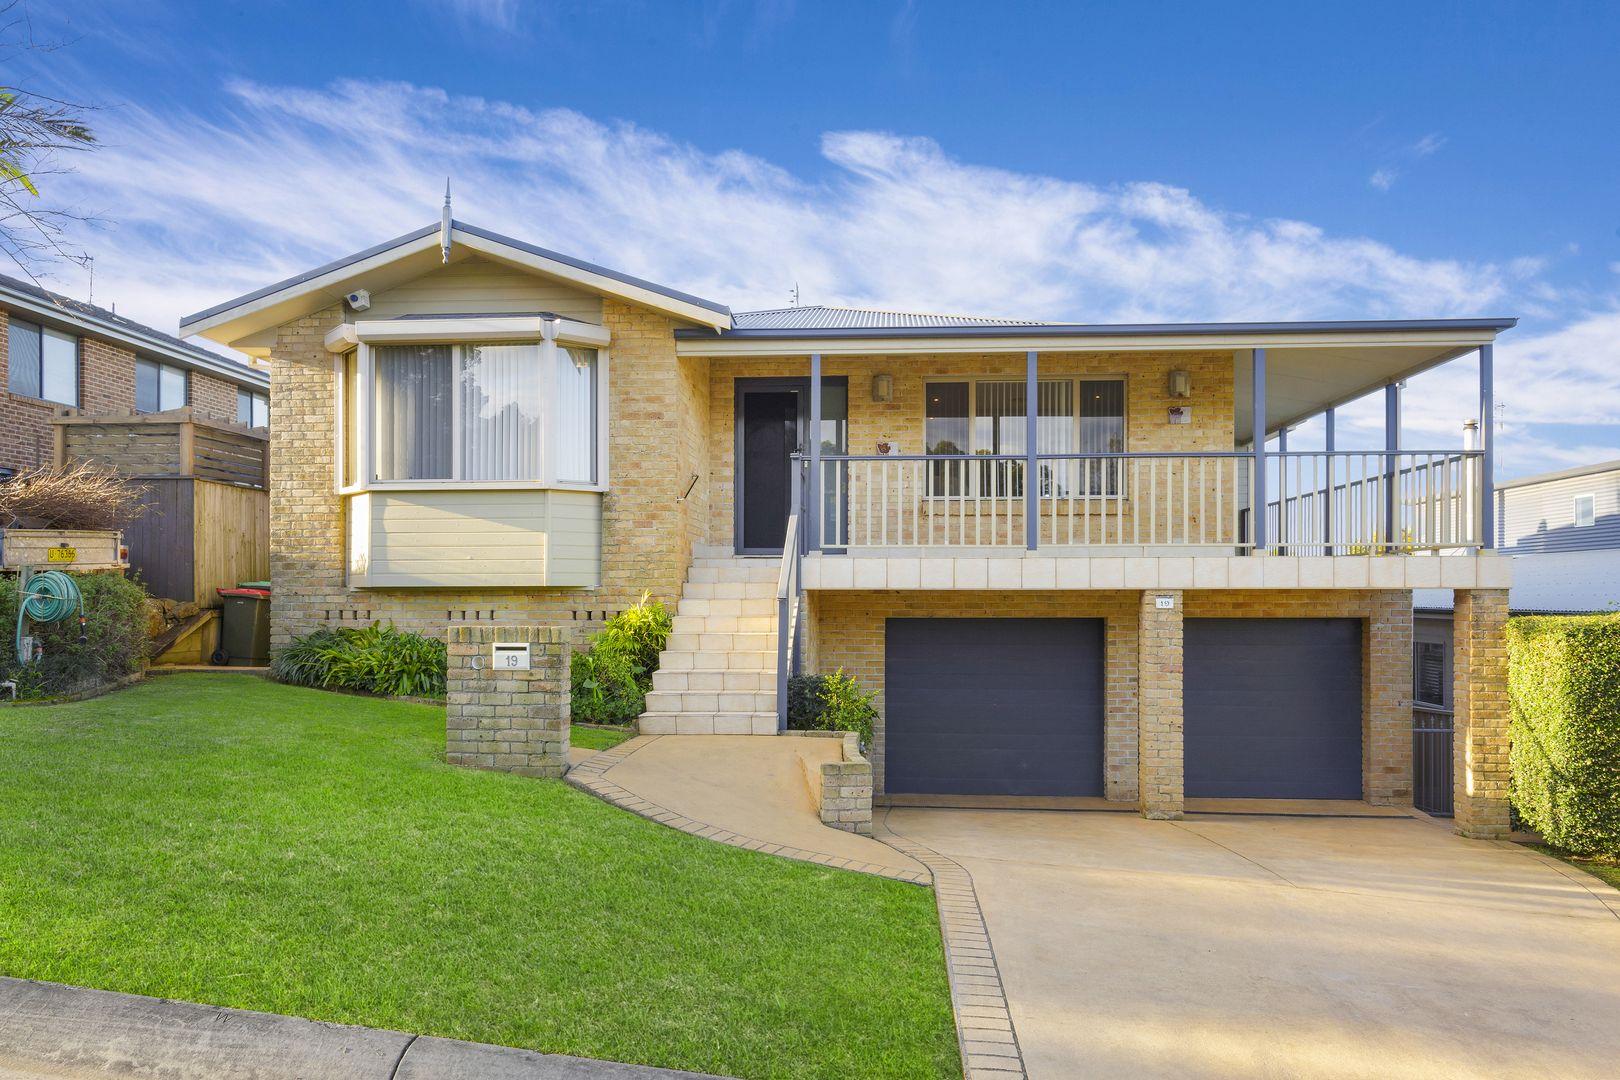 19 Danube Street, Kiama NSW 2533, Image 0